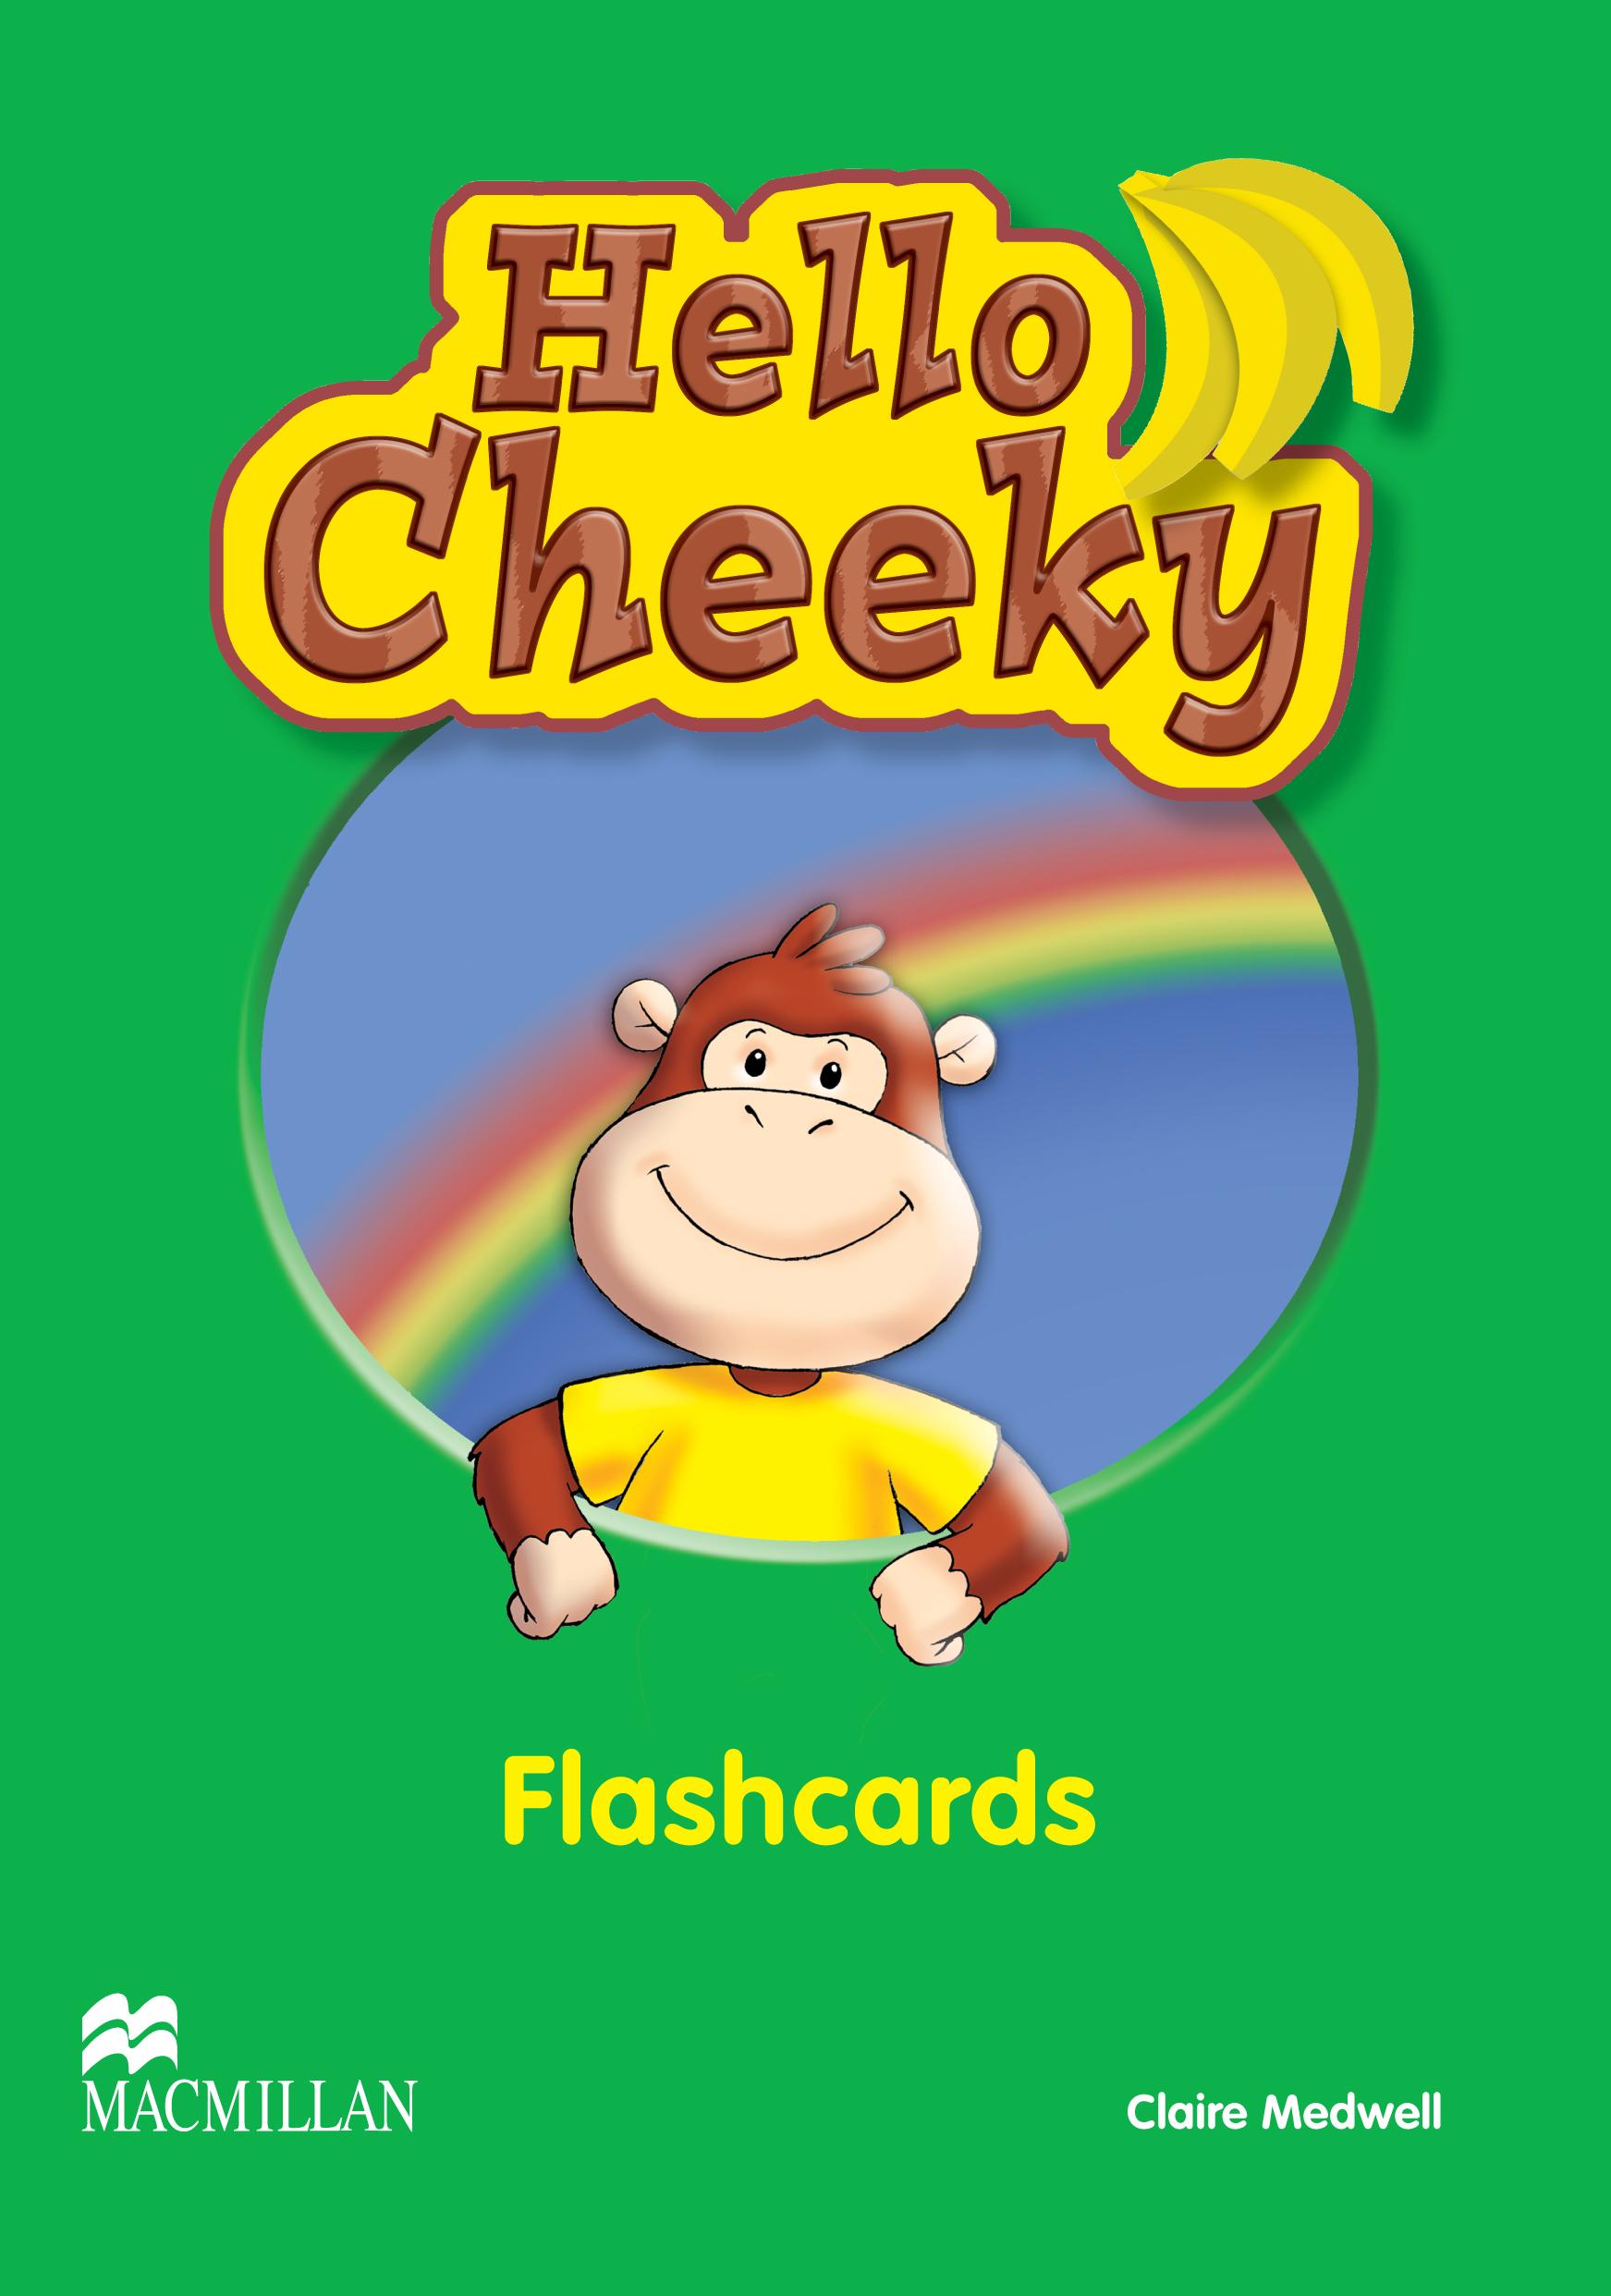 Hello Cheeky Flashcards